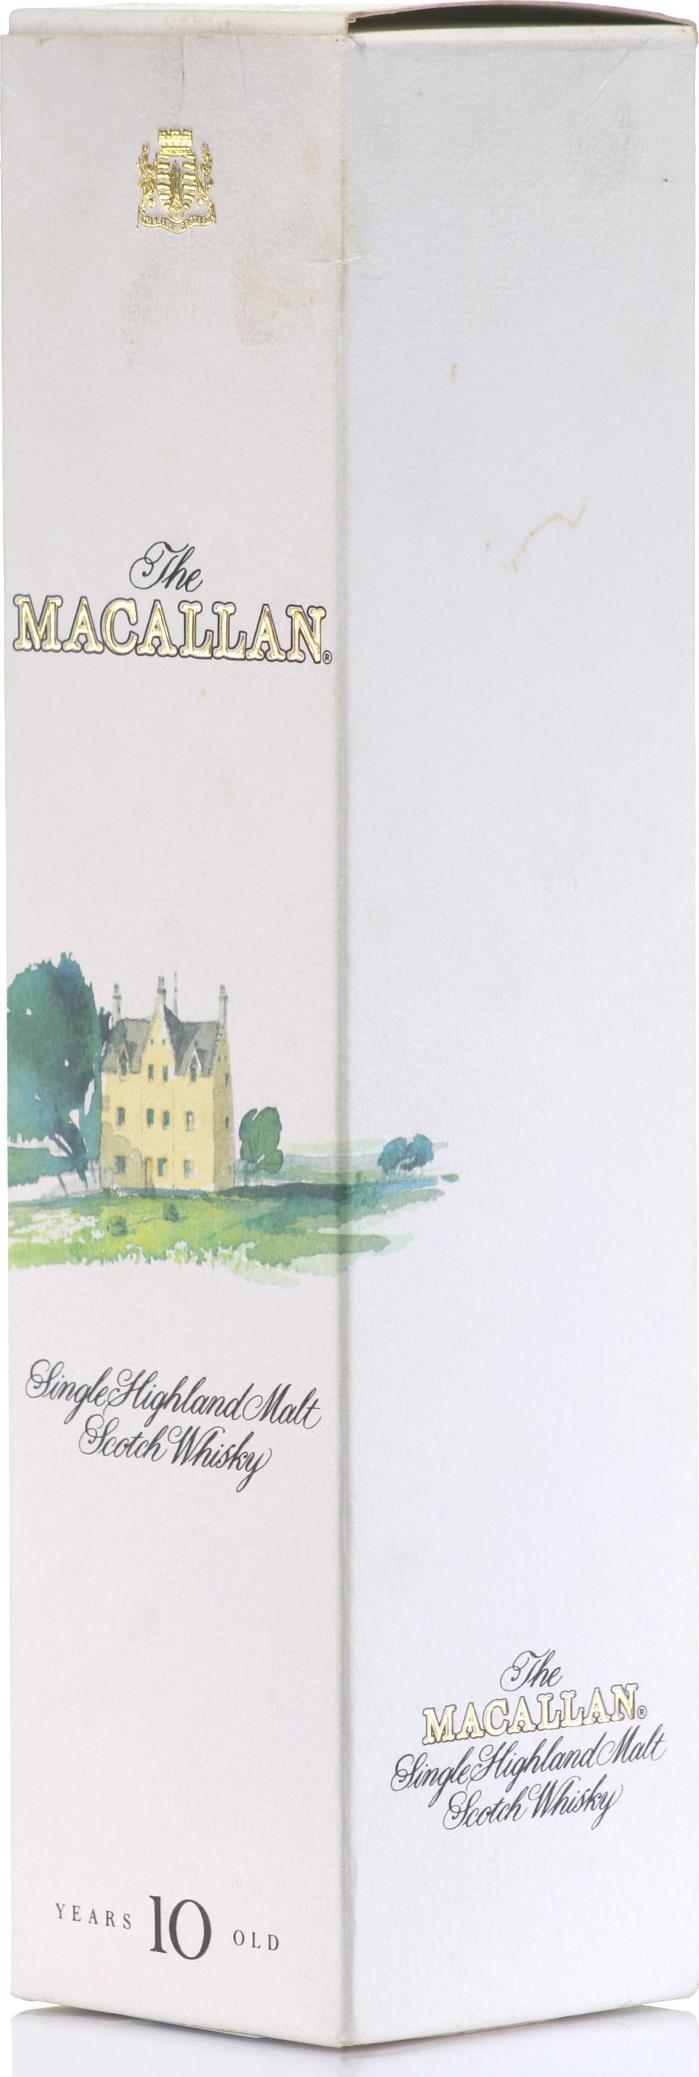 Whisky Macallan 10 YO Sherry Wood 1990s